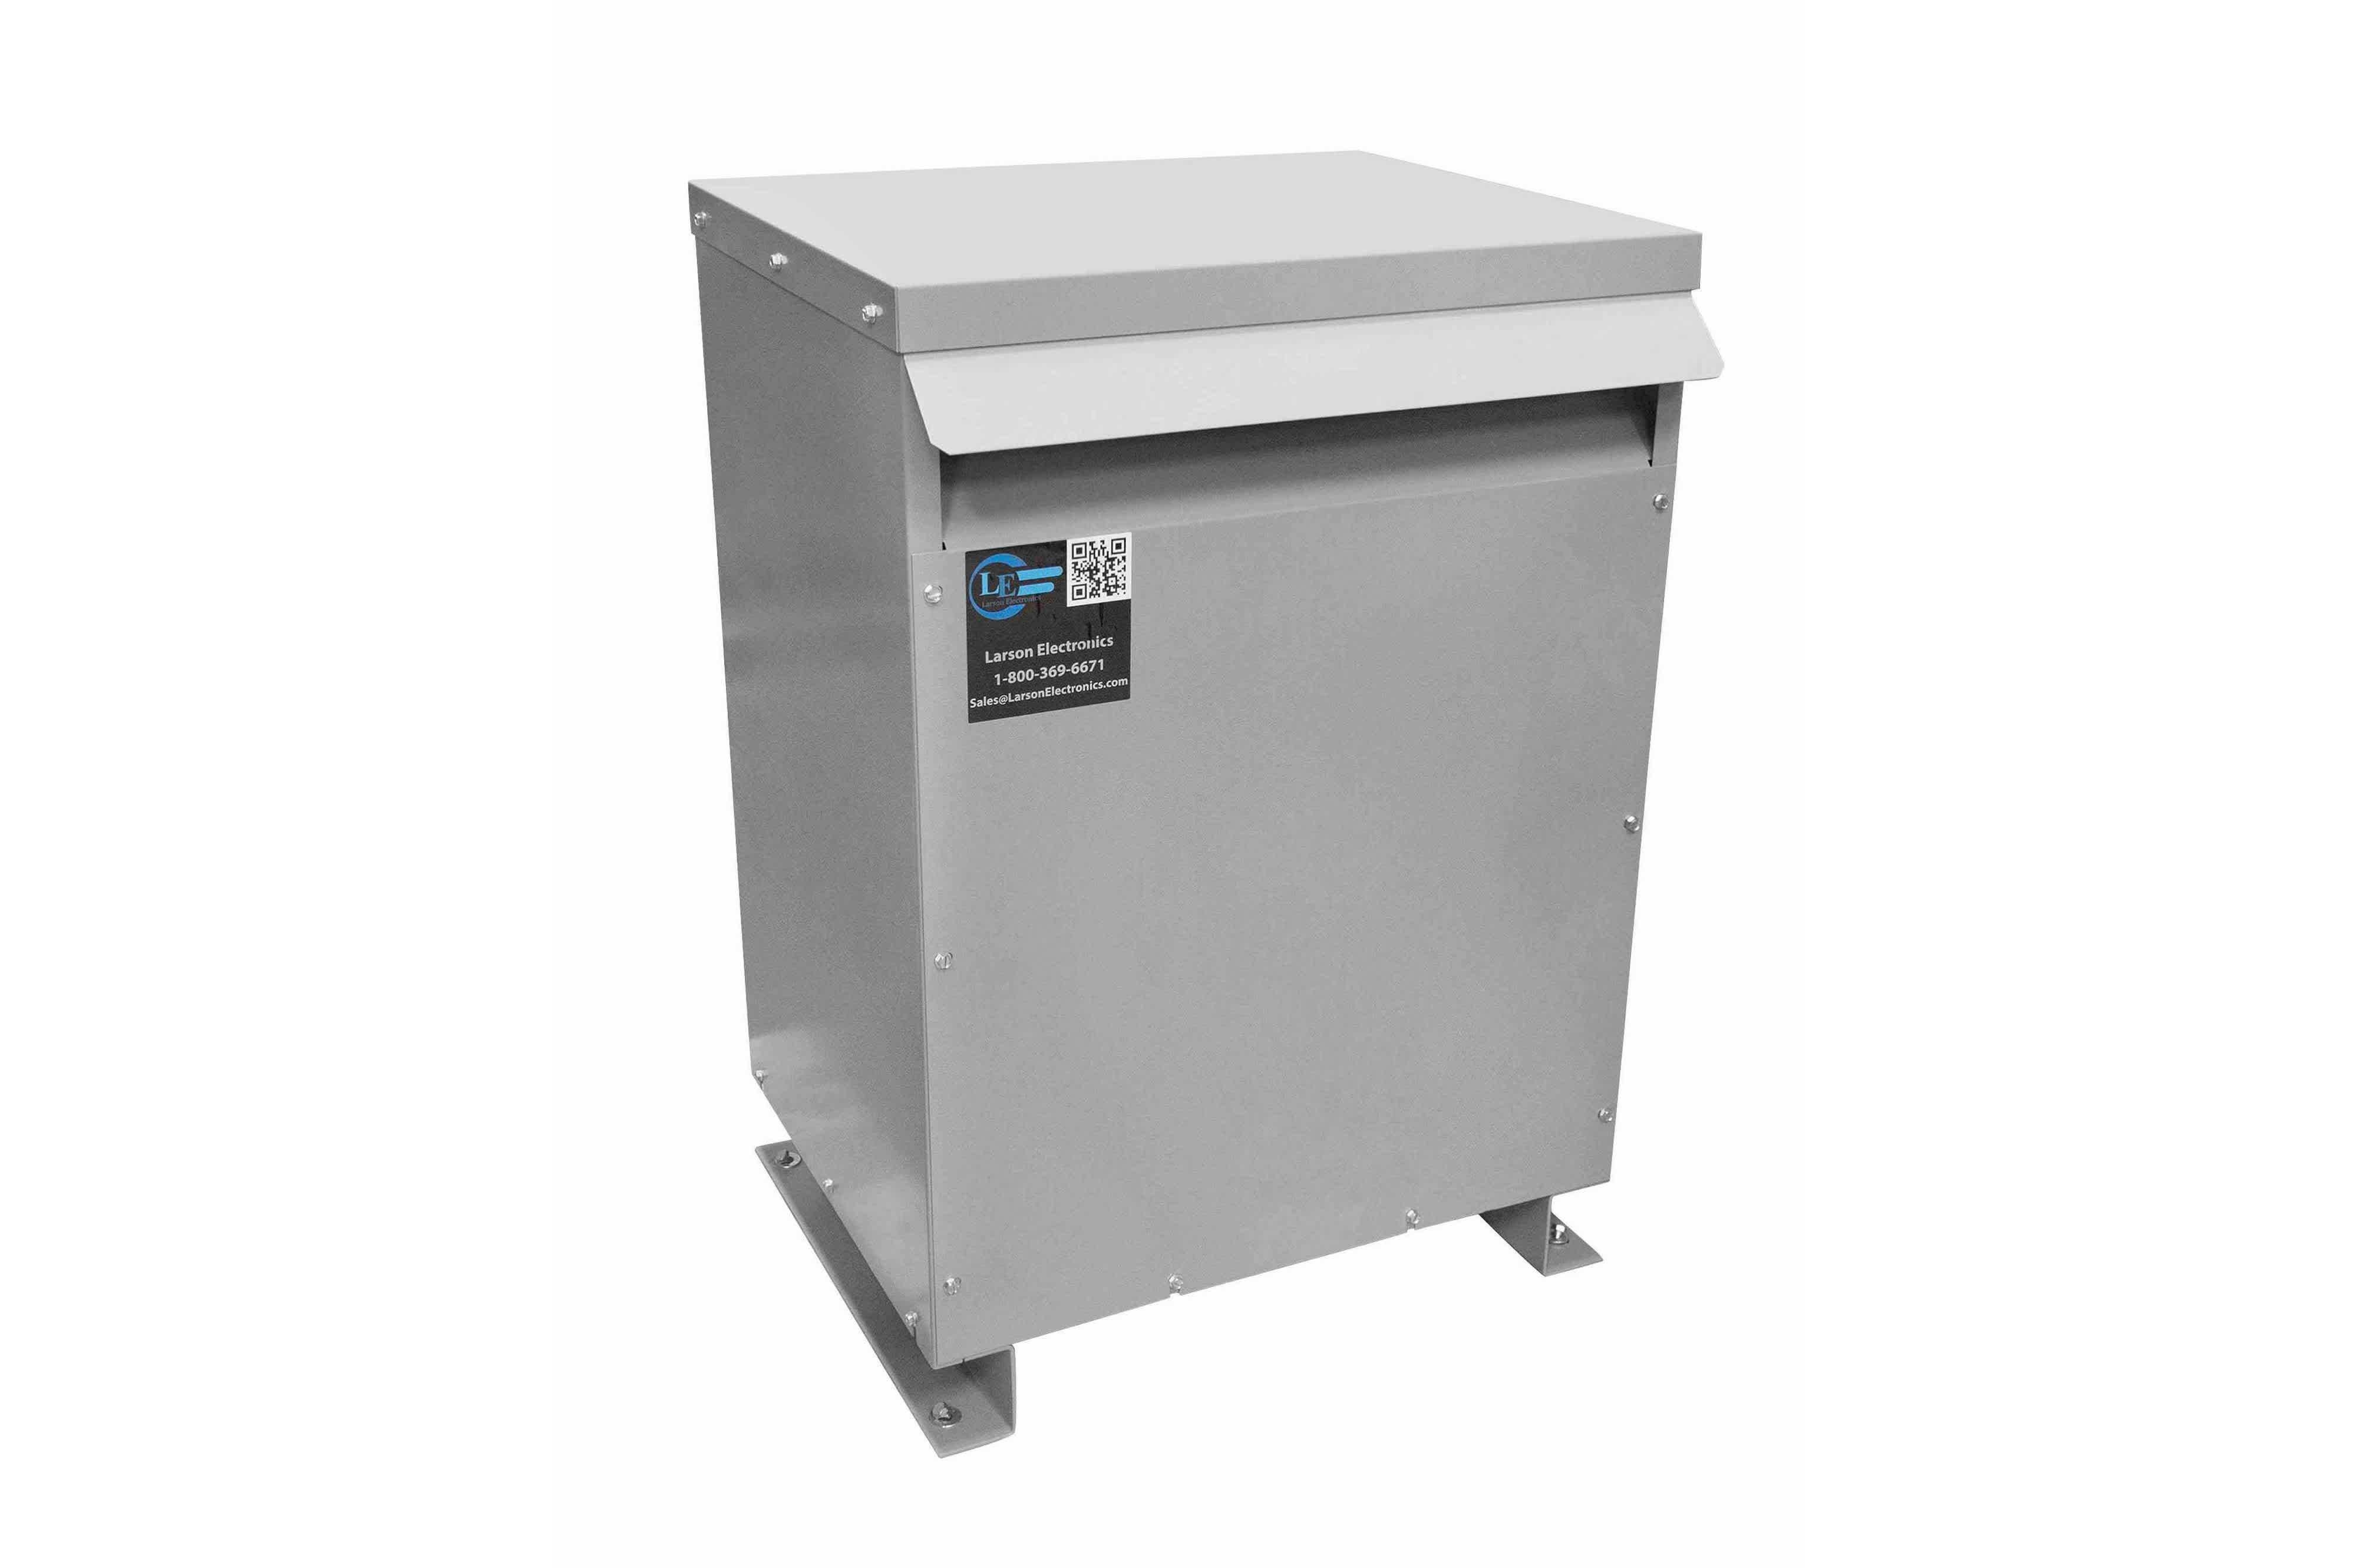 55 kVA 3PH Isolation Transformer, 400V Wye Primary, 240V Delta Secondary, N3R, Ventilated, 60 Hz